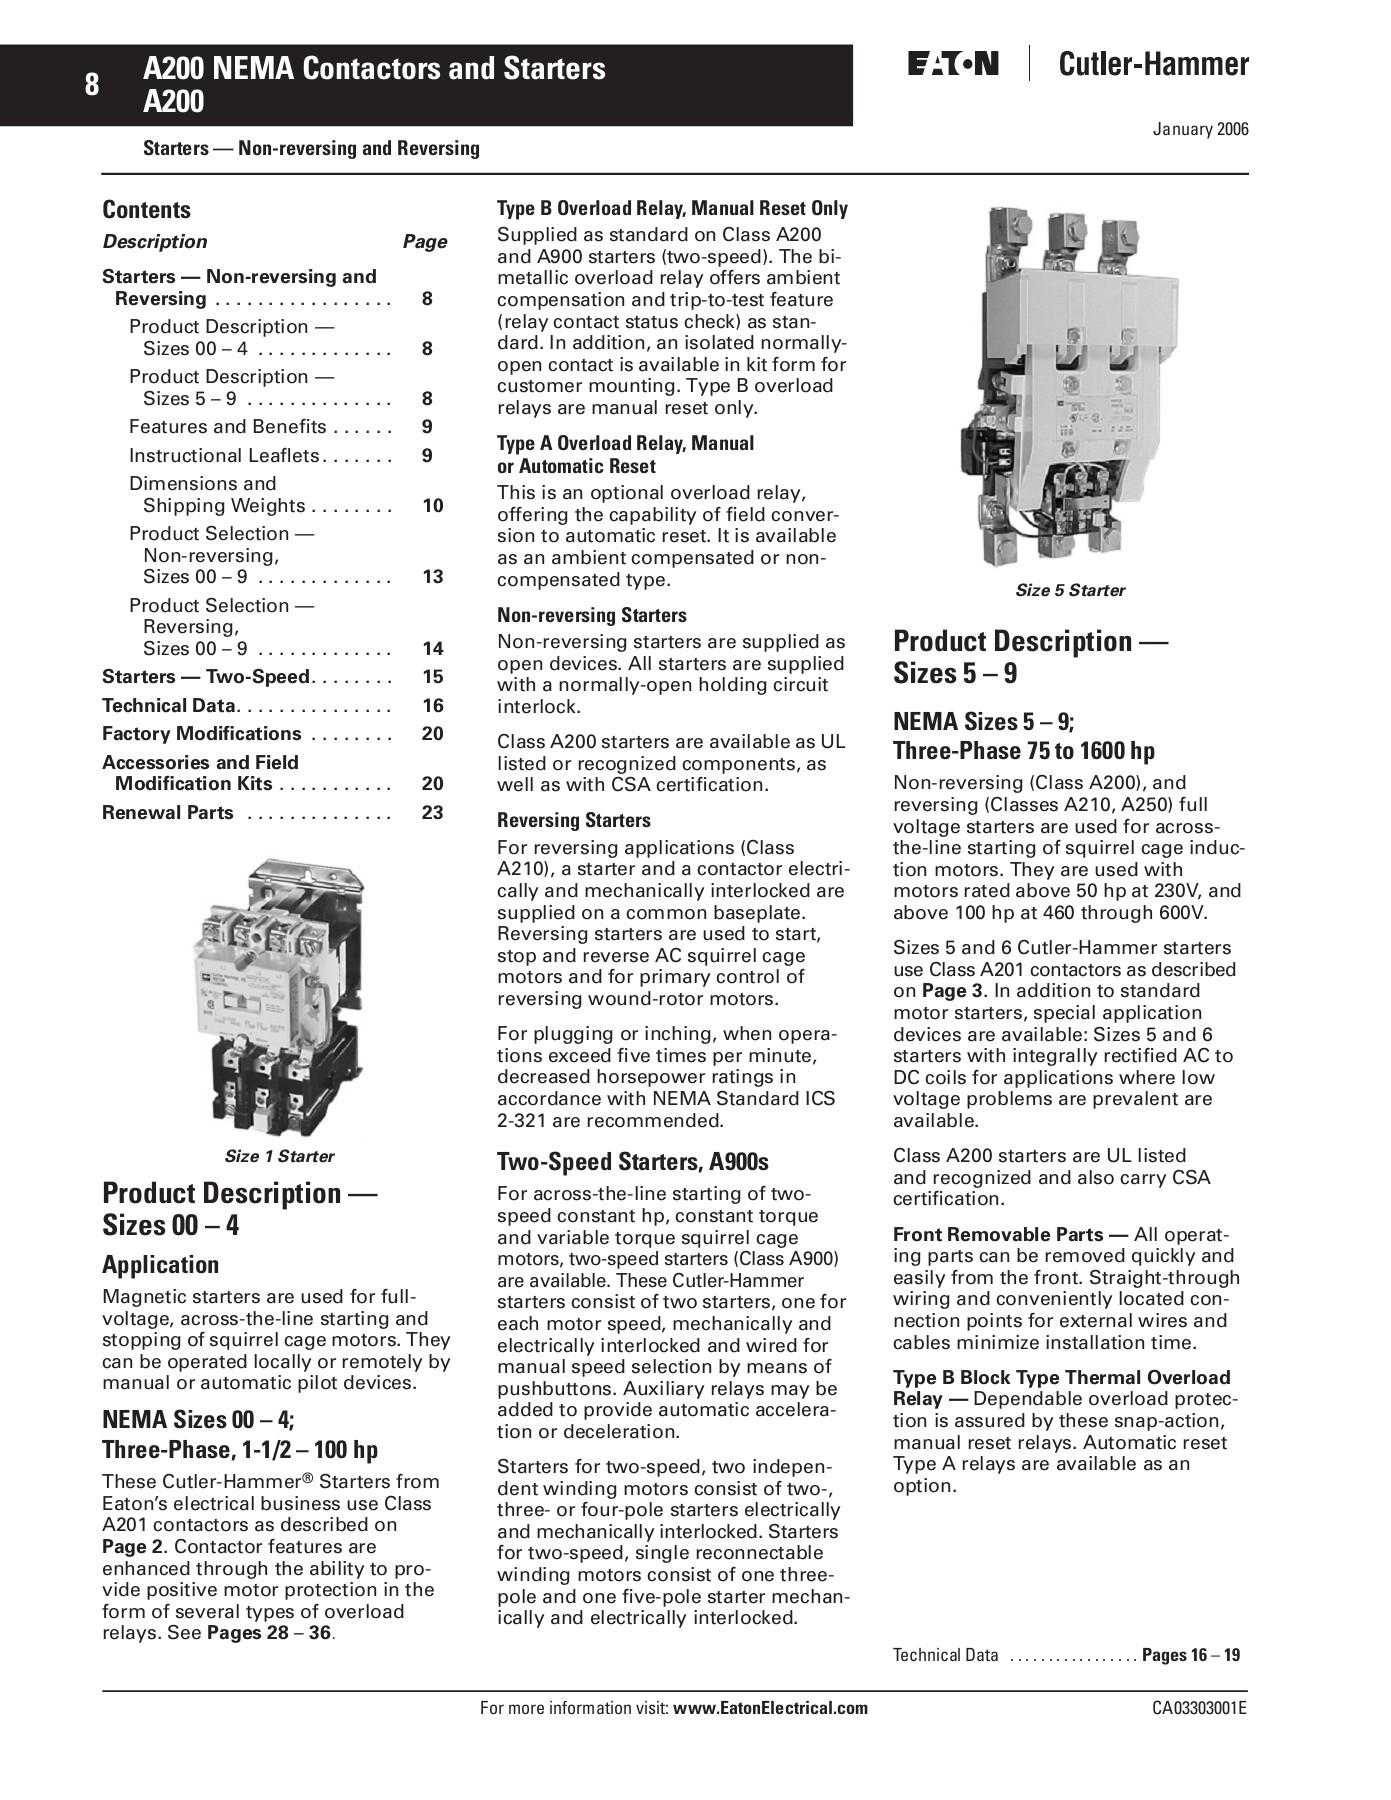 Nema Size 1 Motor Starter Wiring Diagram